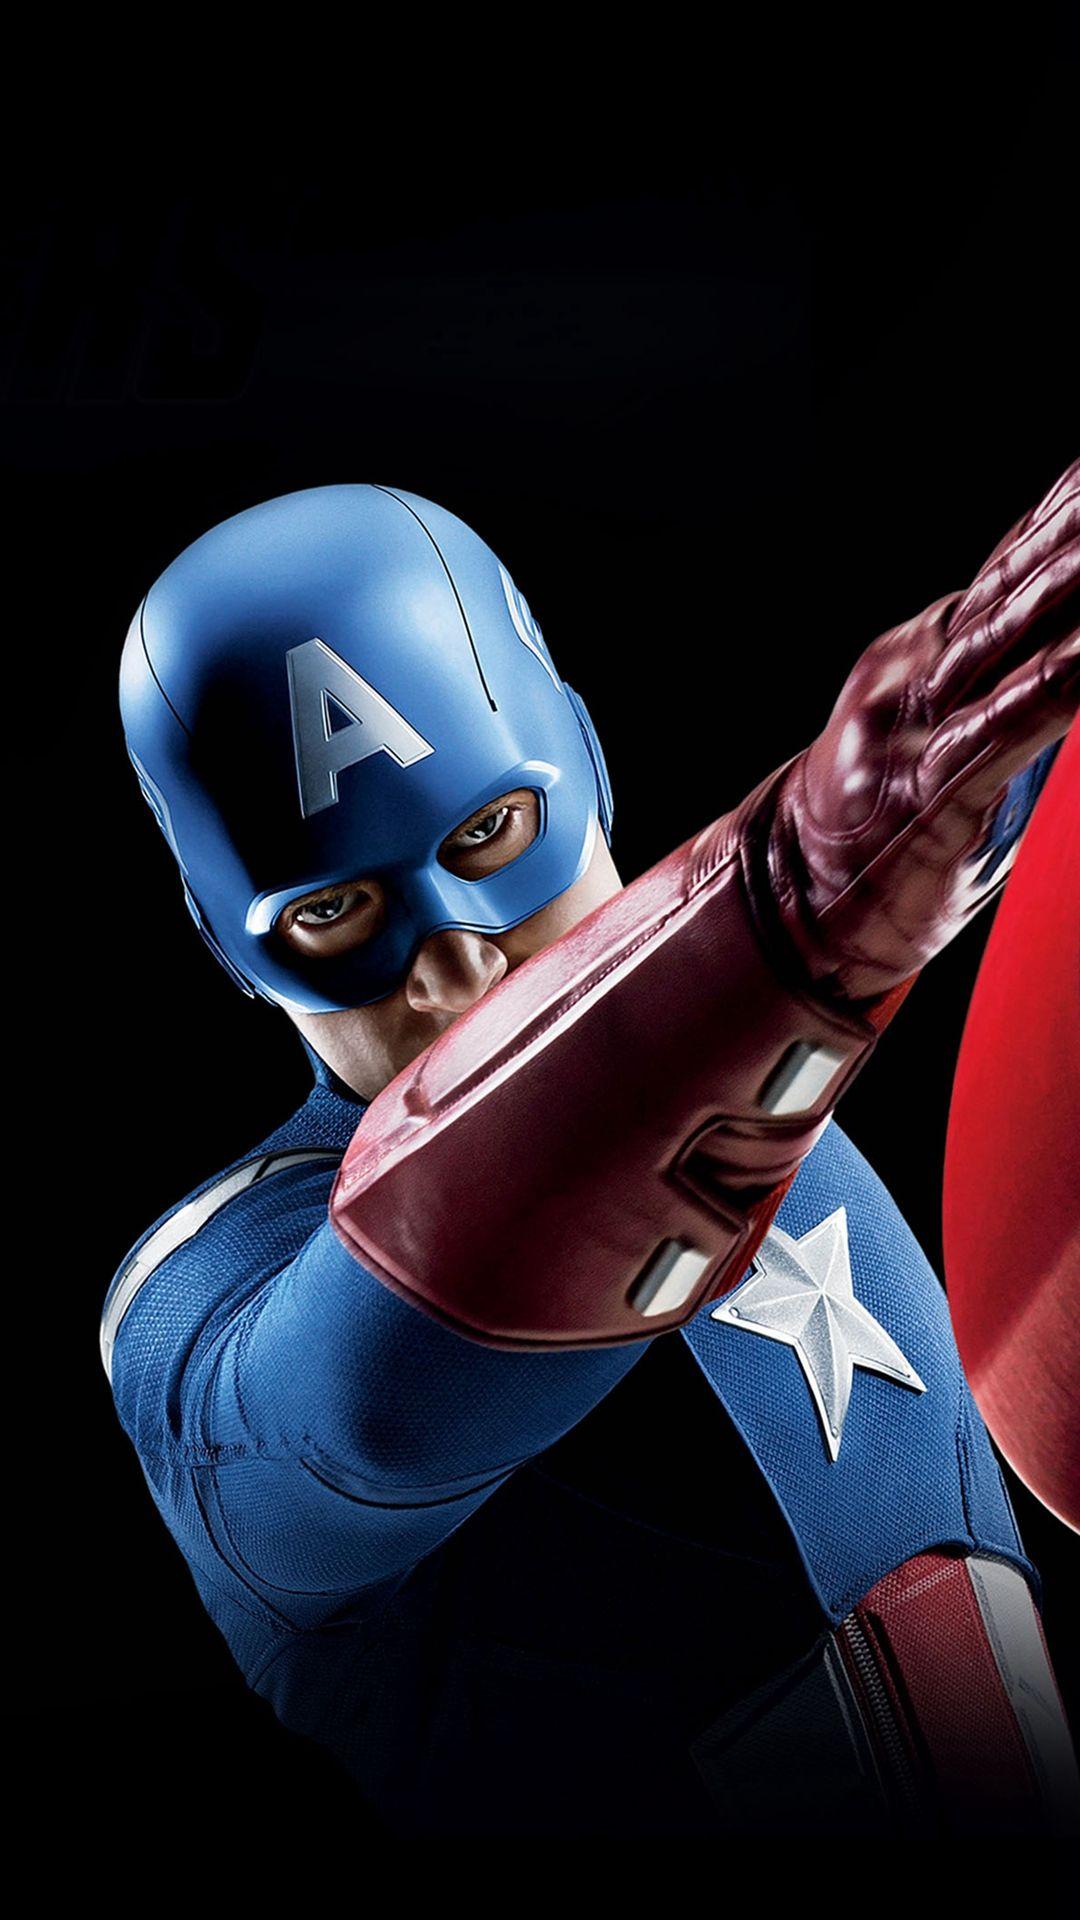 Avengers Captain America Illust Art Portrait iPhone 6